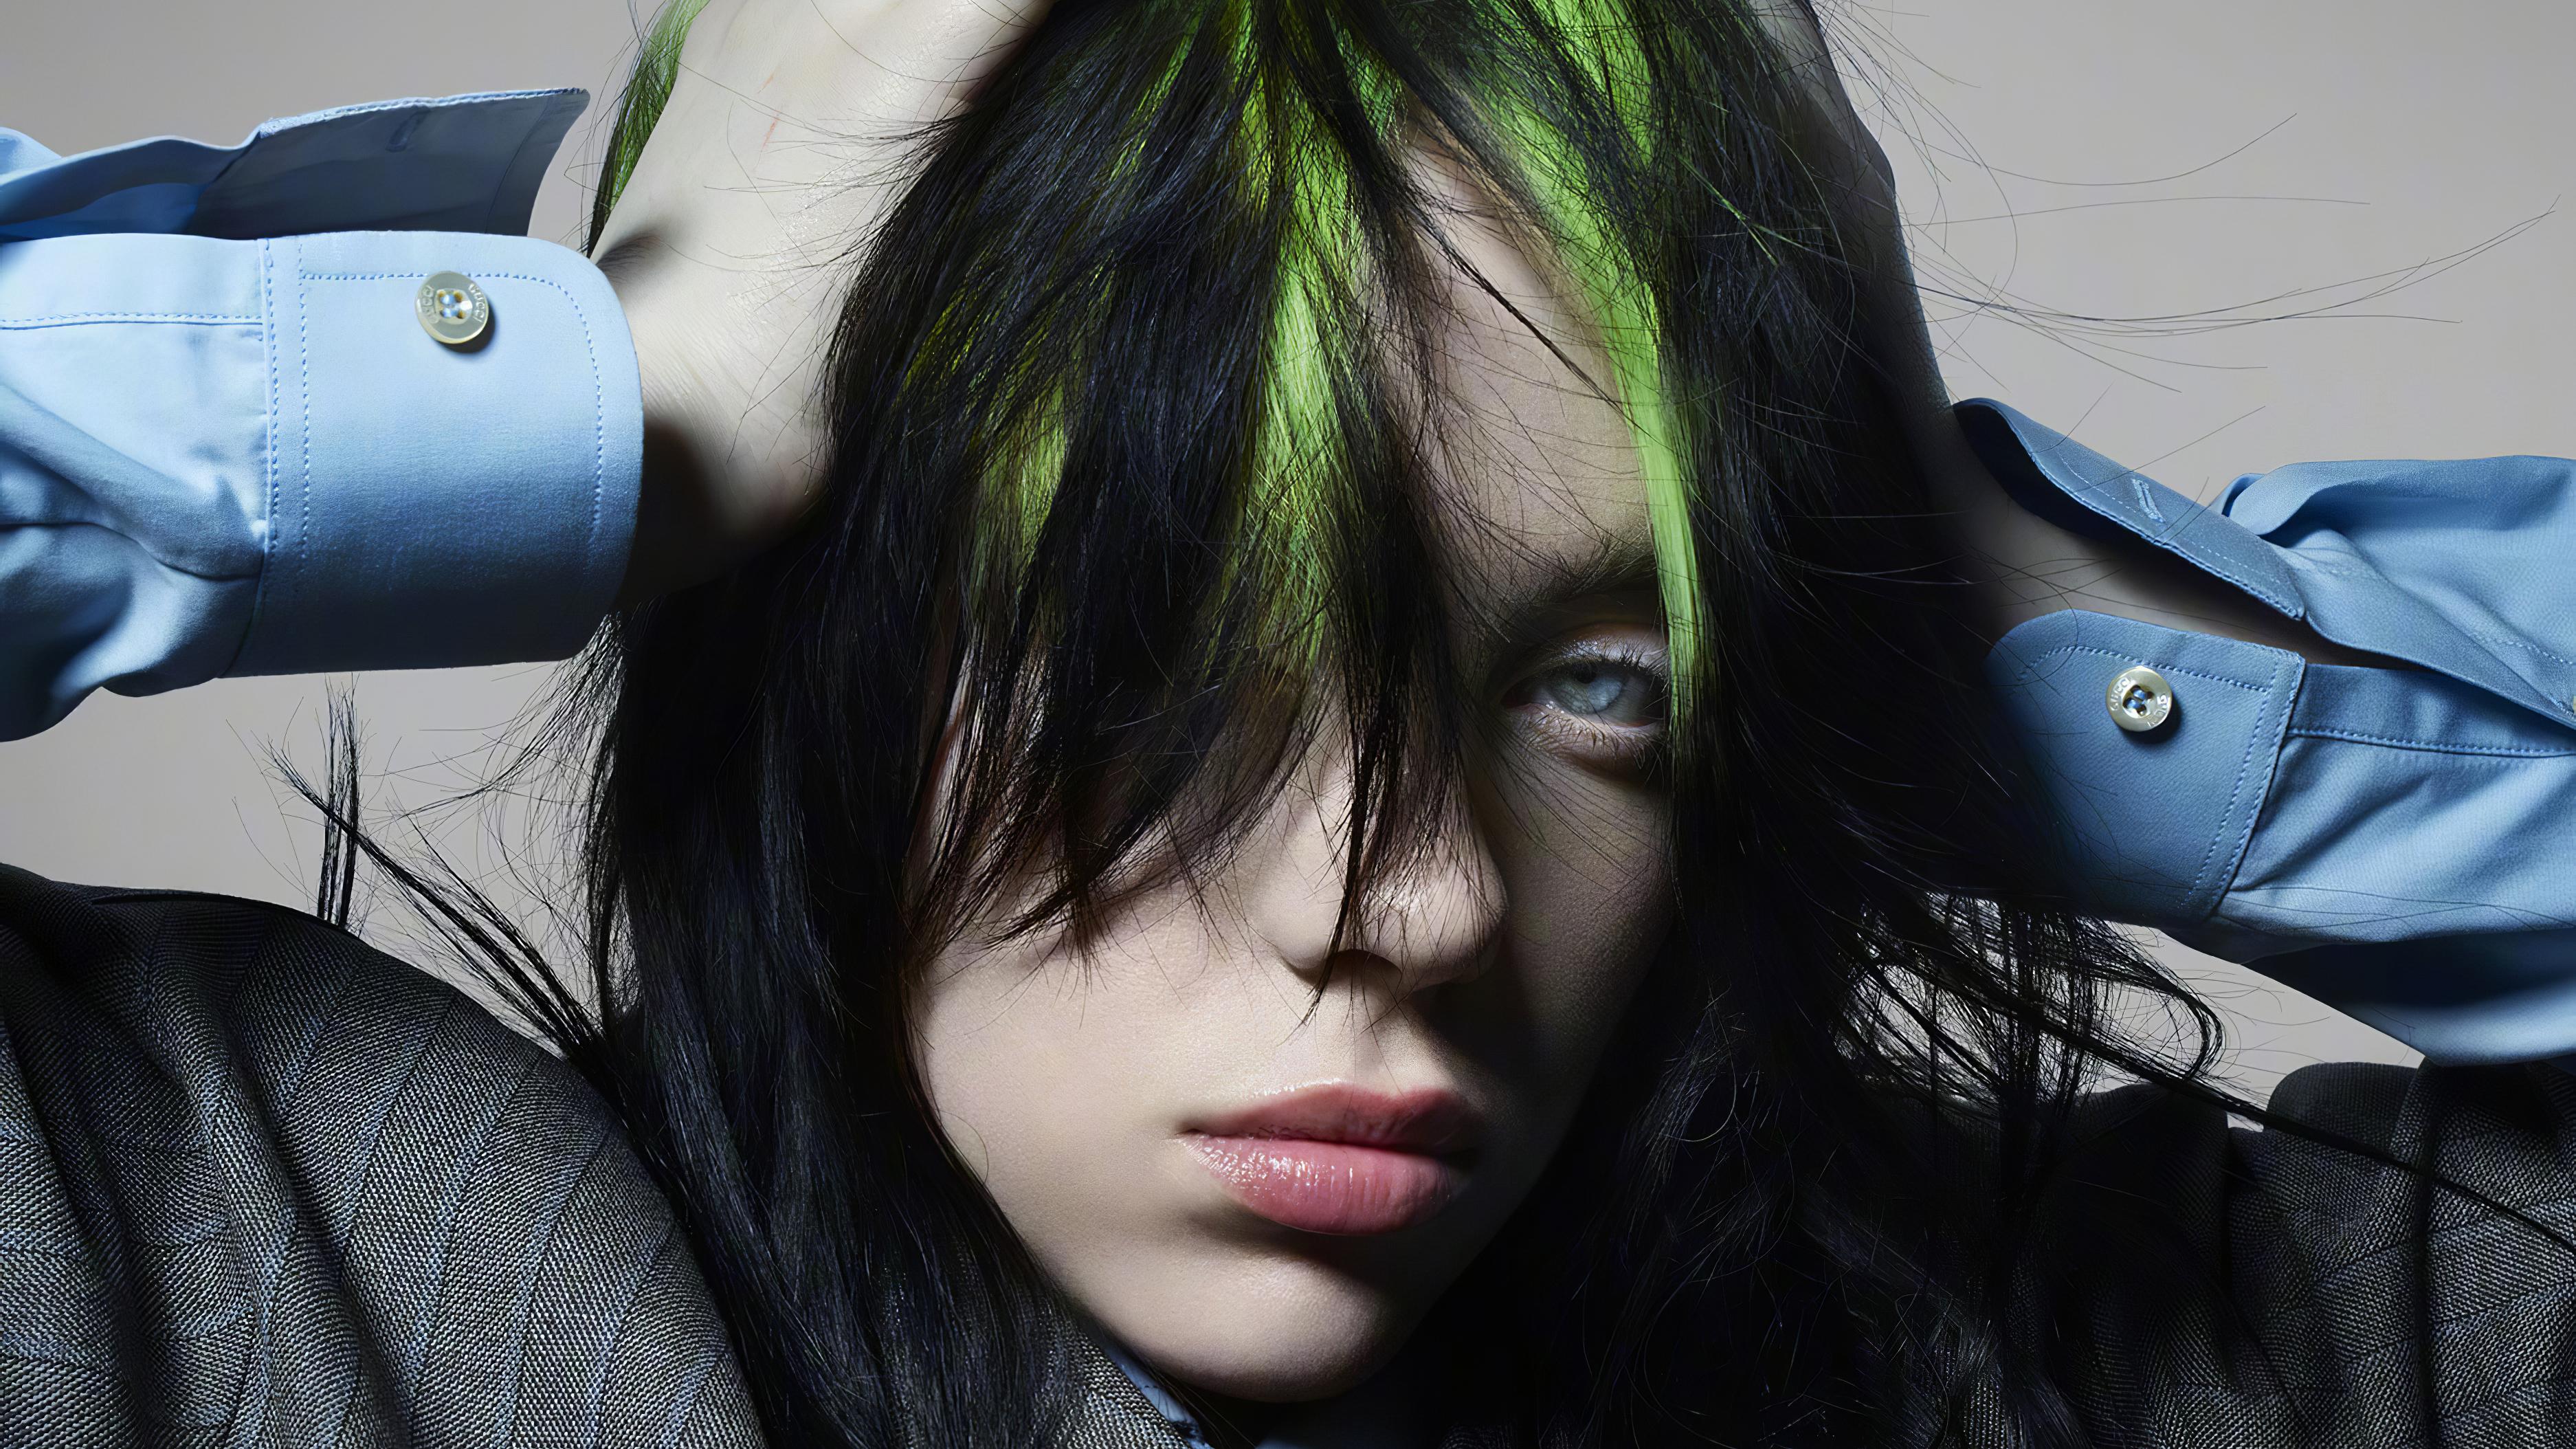 Singer Billie Eilish Face Wallpaper, HD Celebrities 4K ...